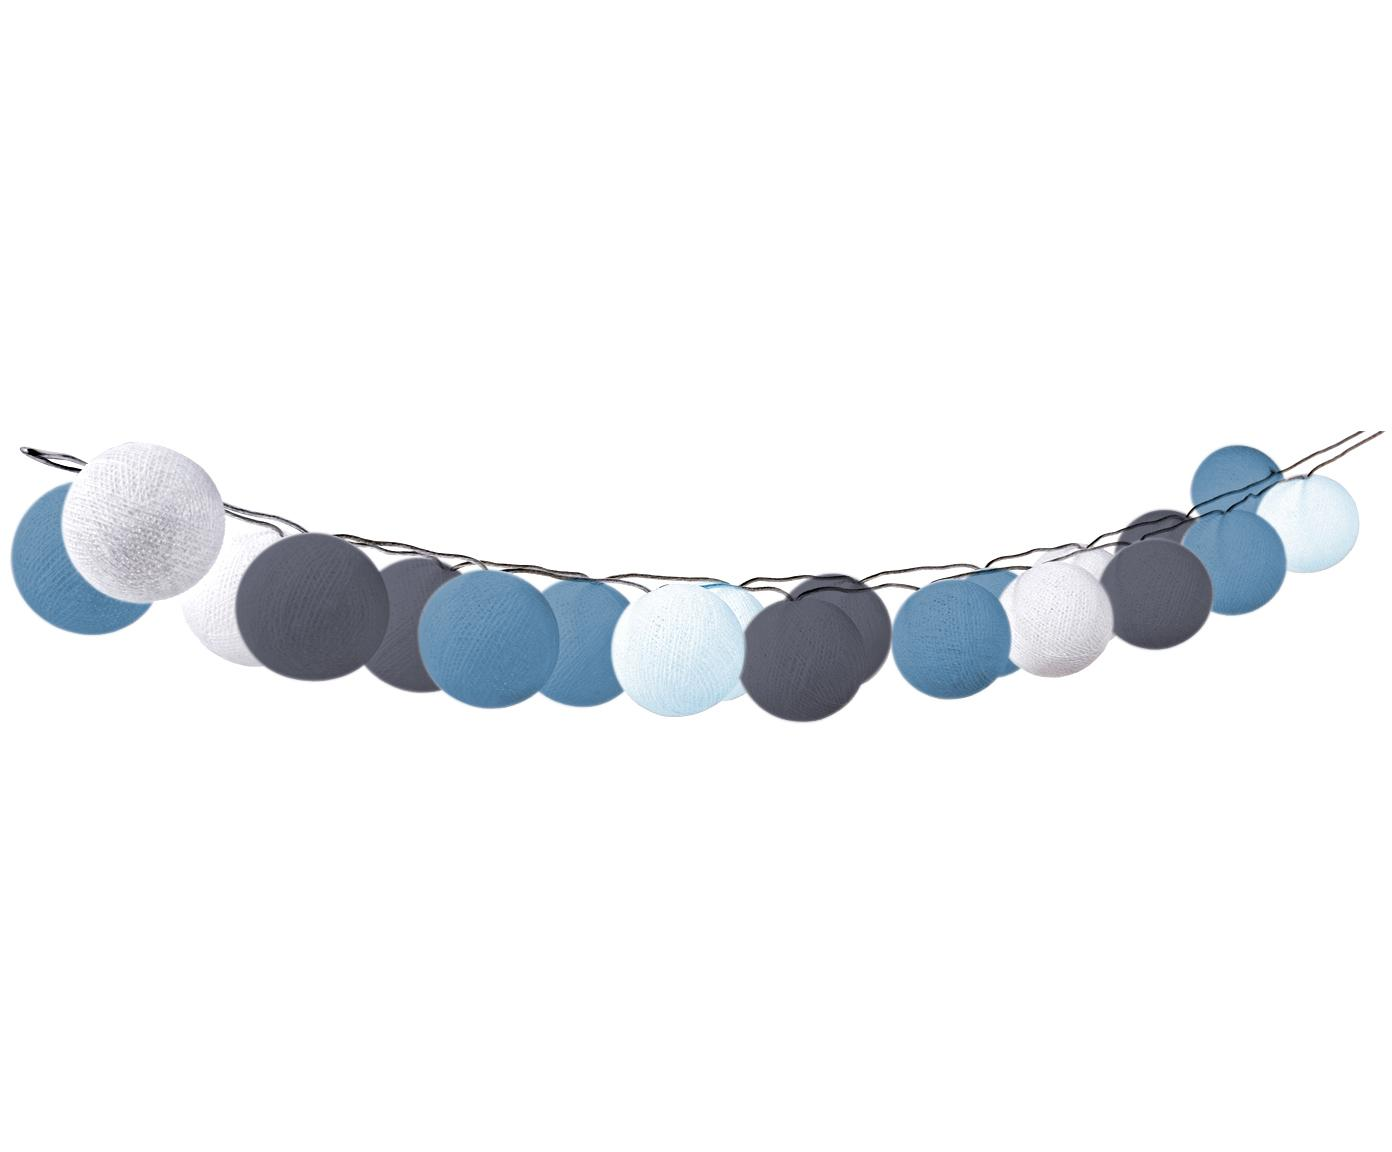 LED Lichterkette Bellin, 320 cm, Lampions: Baumwolle, Blau, Hellblau, Dunkelblau, Weiss, L 320 cm